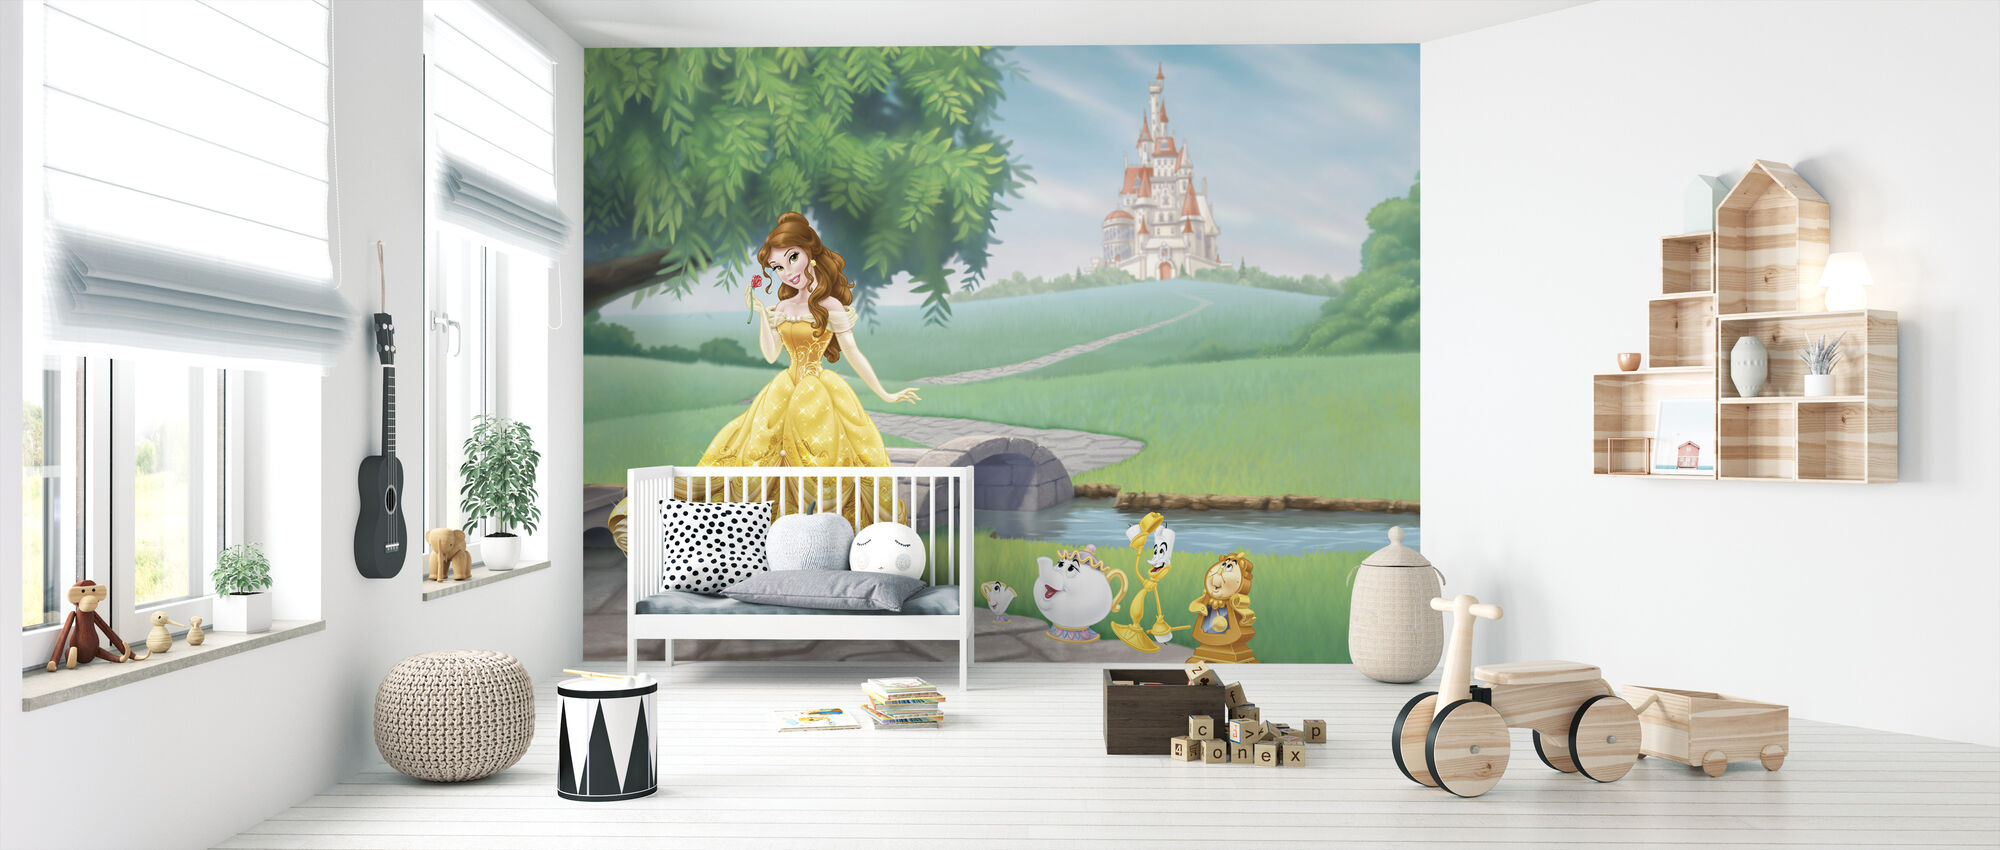 Disney Princess - Belle - Tapetti - Vauvan huone